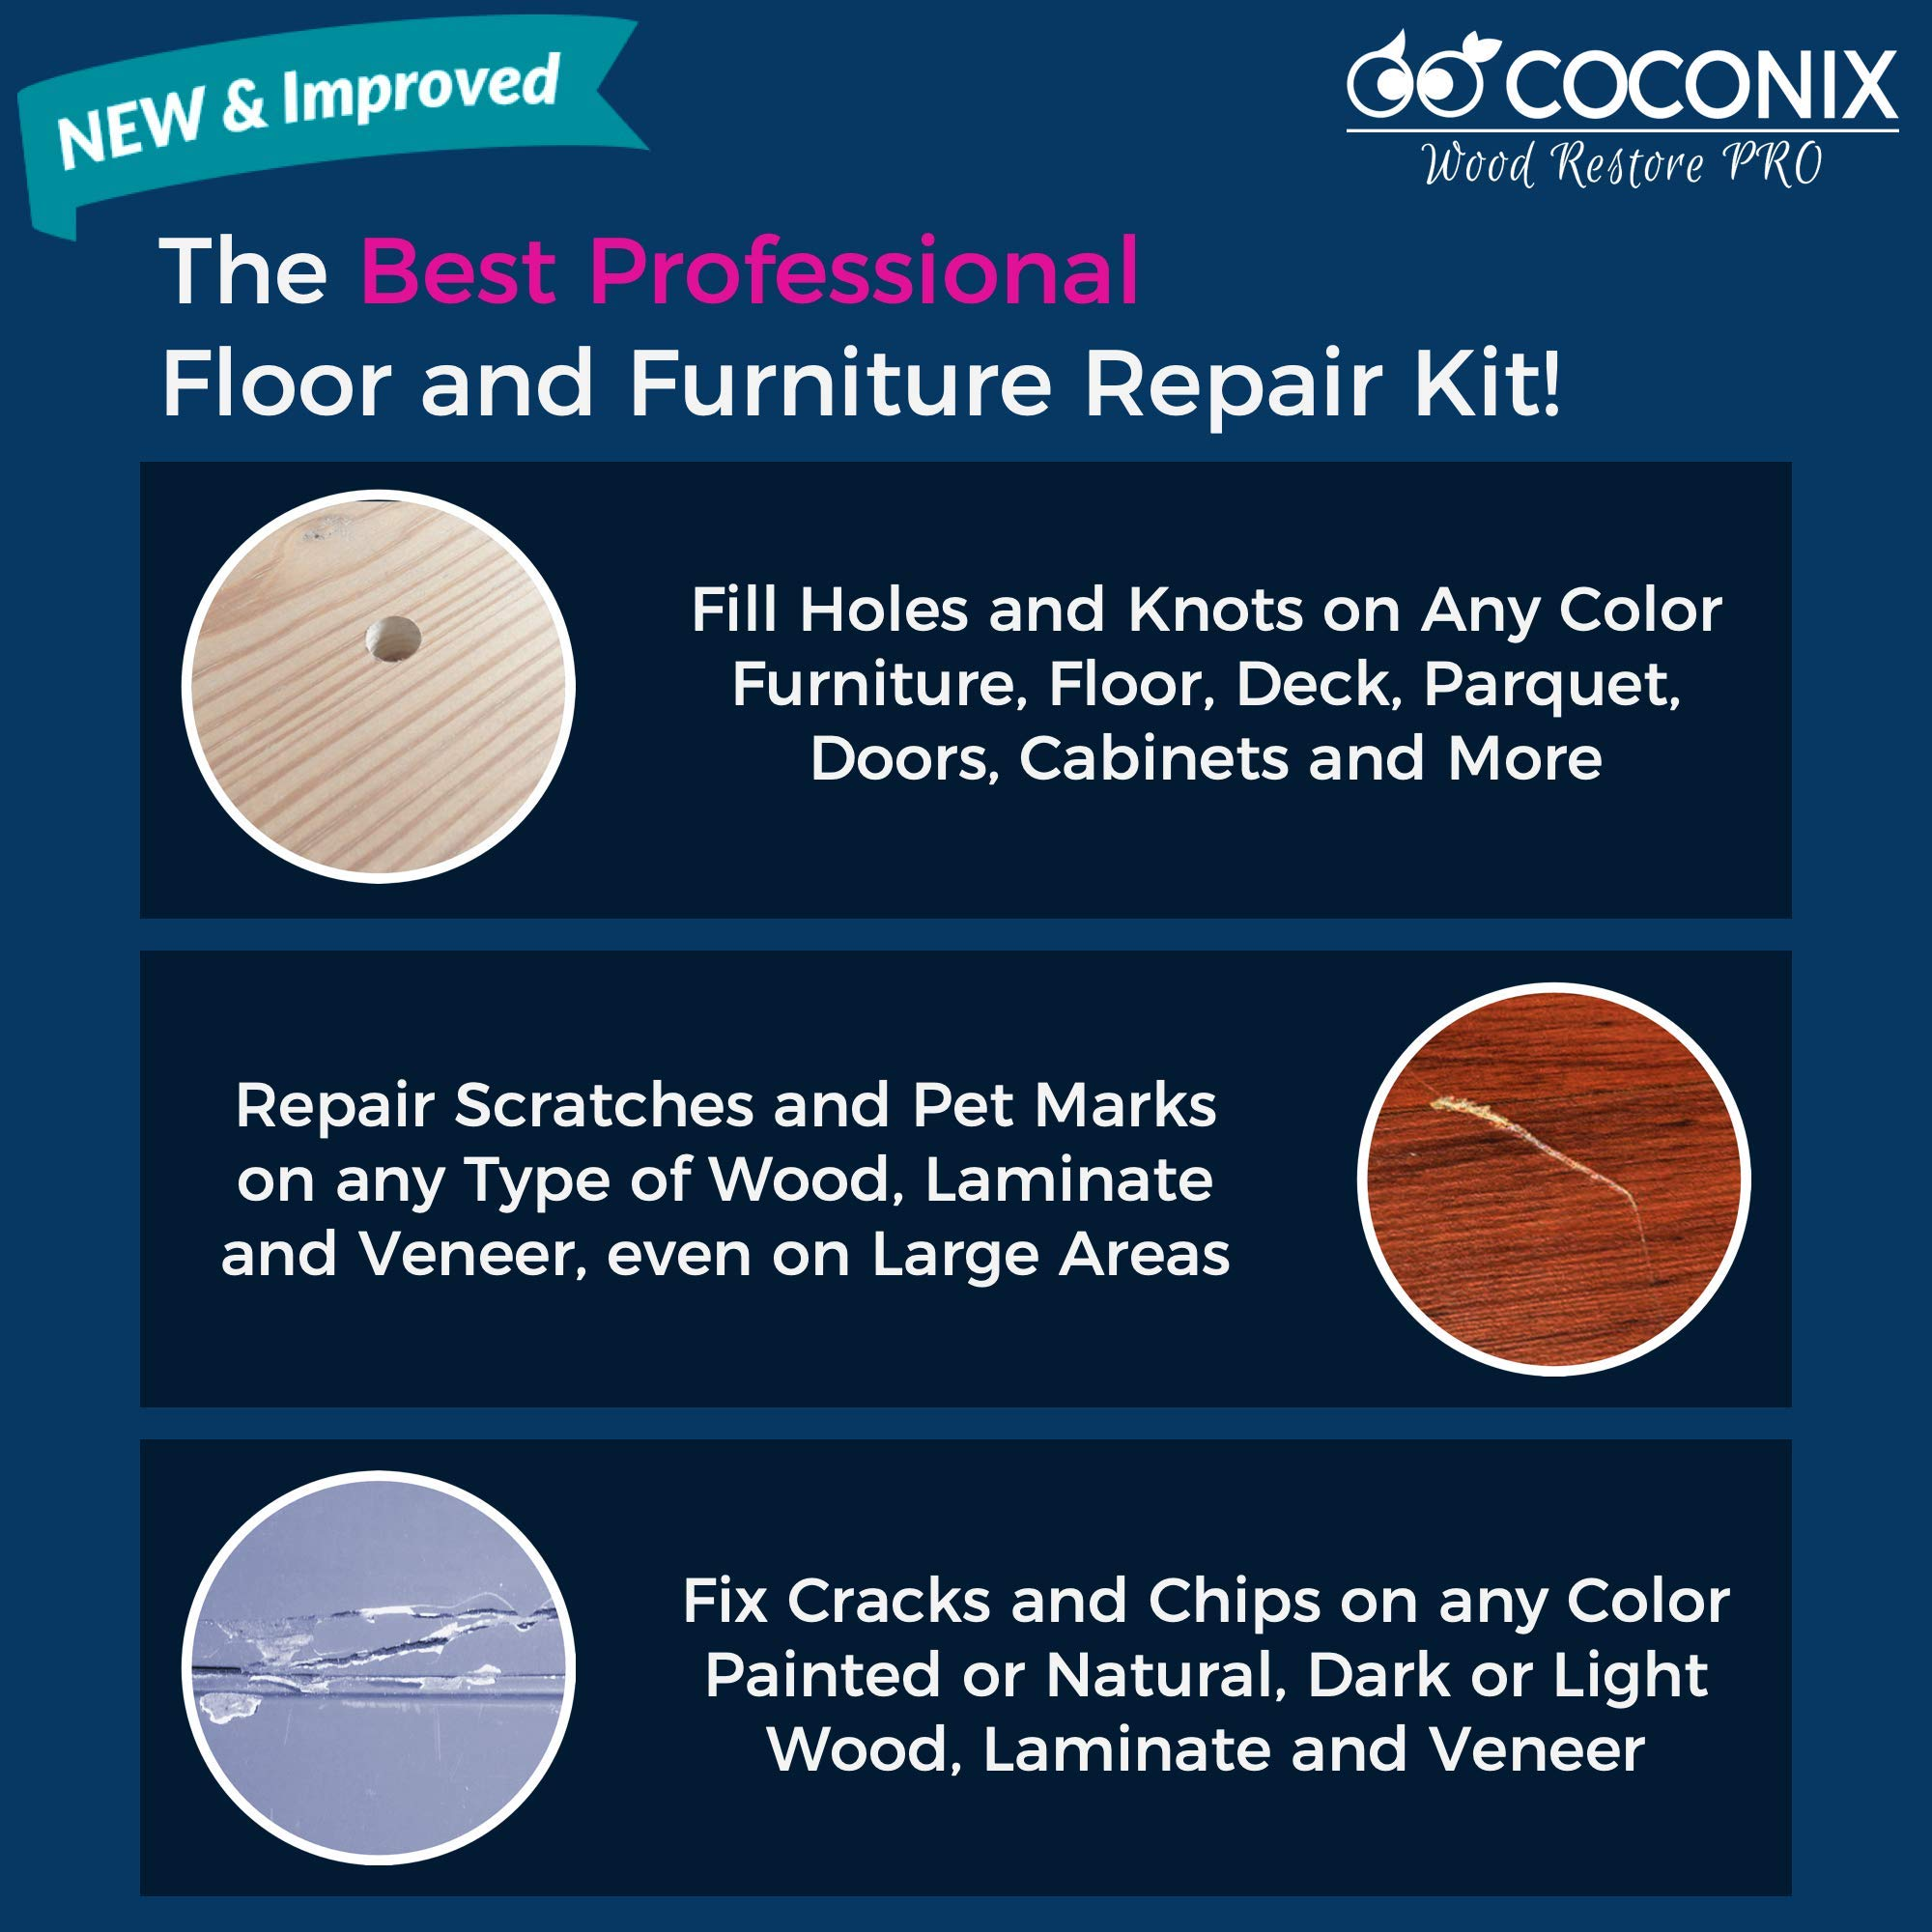 Coconix Wood Restore PRO - Professional Floor & Furniture Repair Kit by Coconix (Image #2)